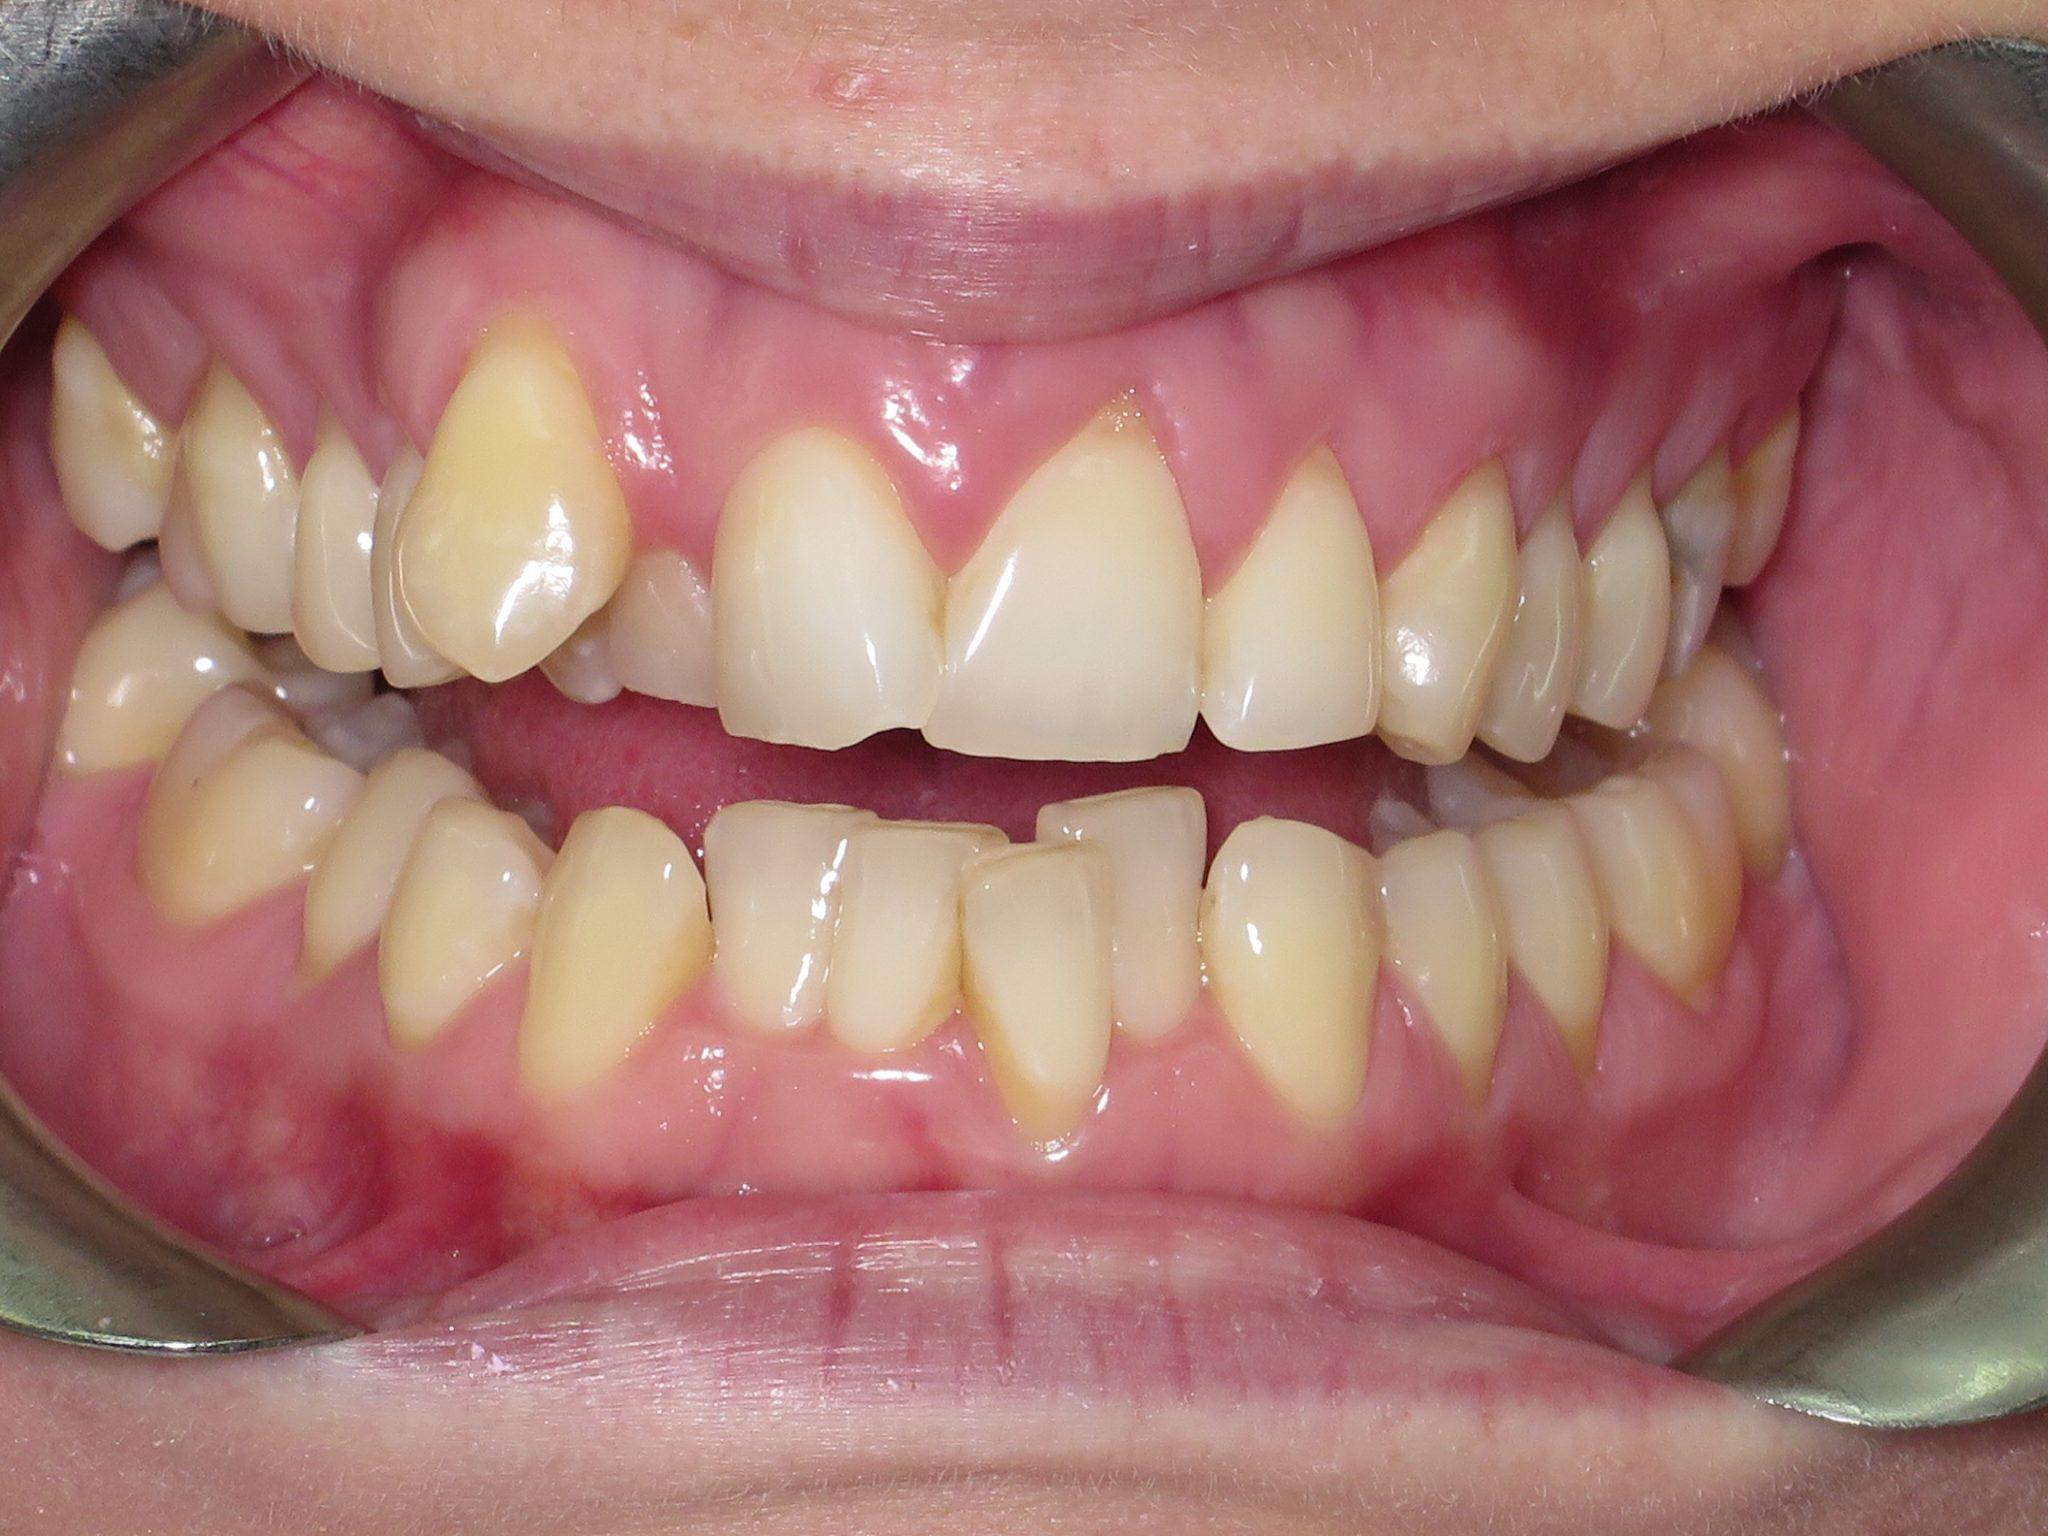 Crooked/Overcrowded Teeth - Teeth In Line